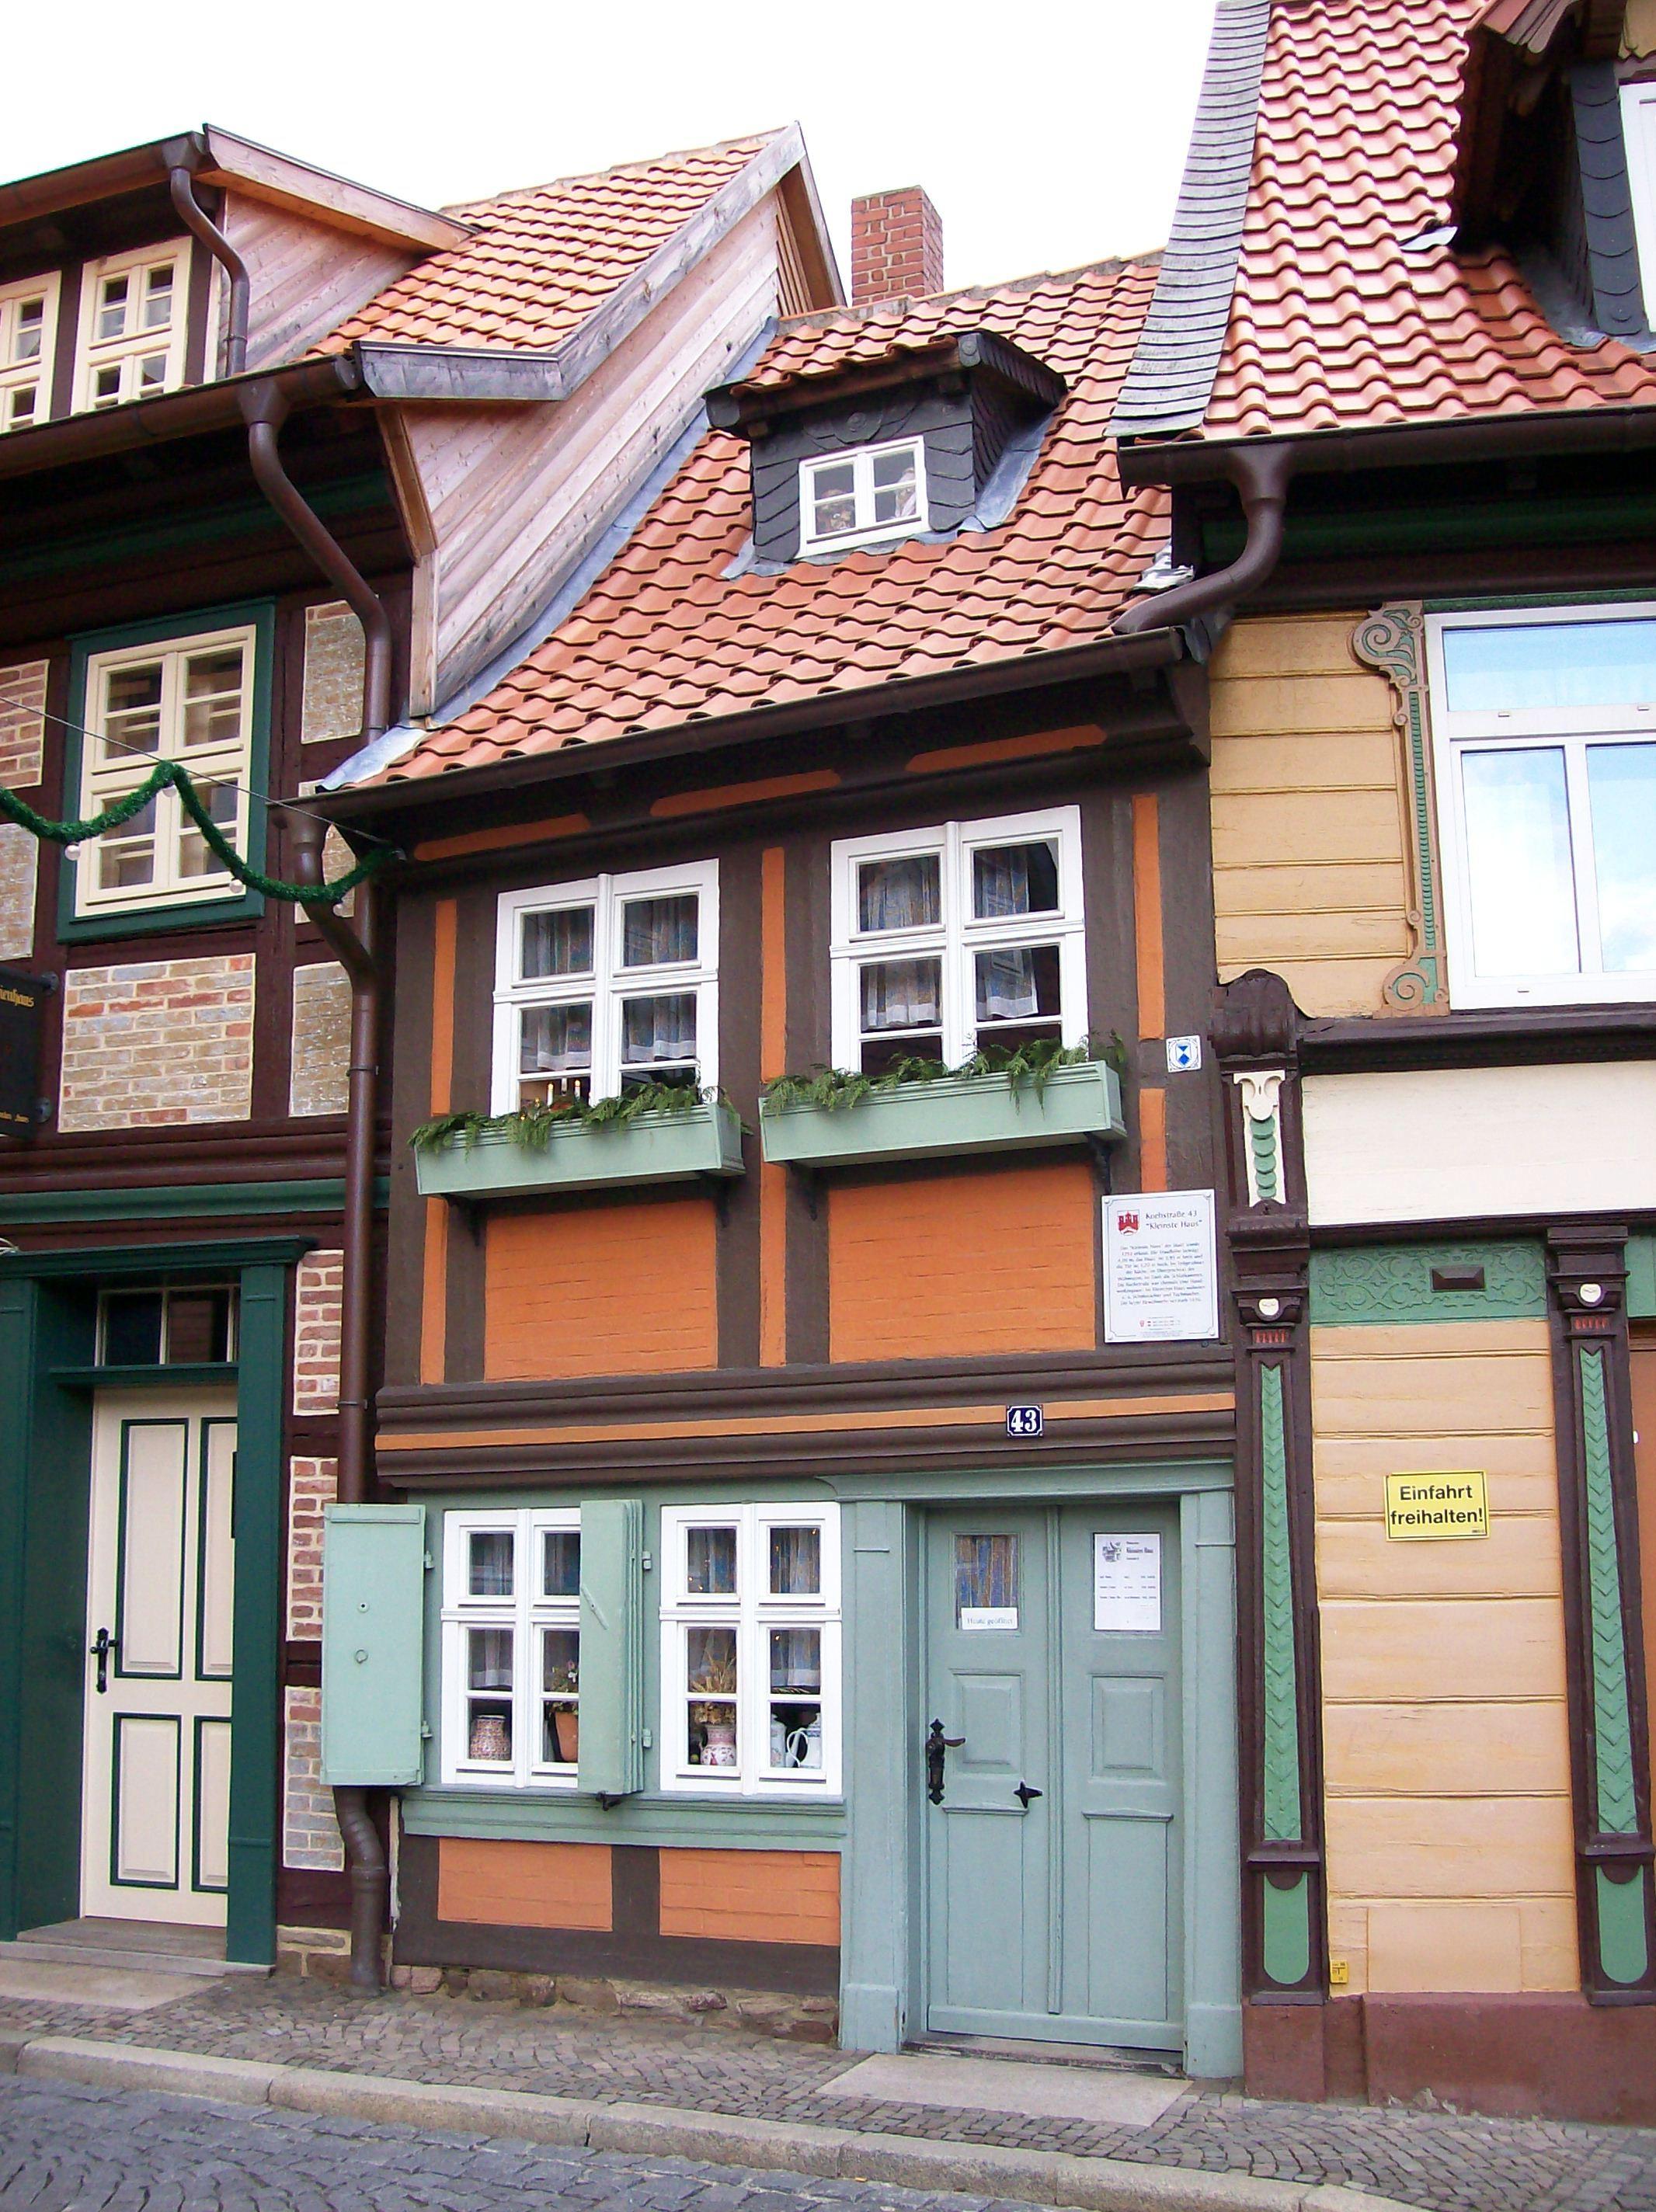 File:Kleines Haus.JPG - Wikimedia Commons